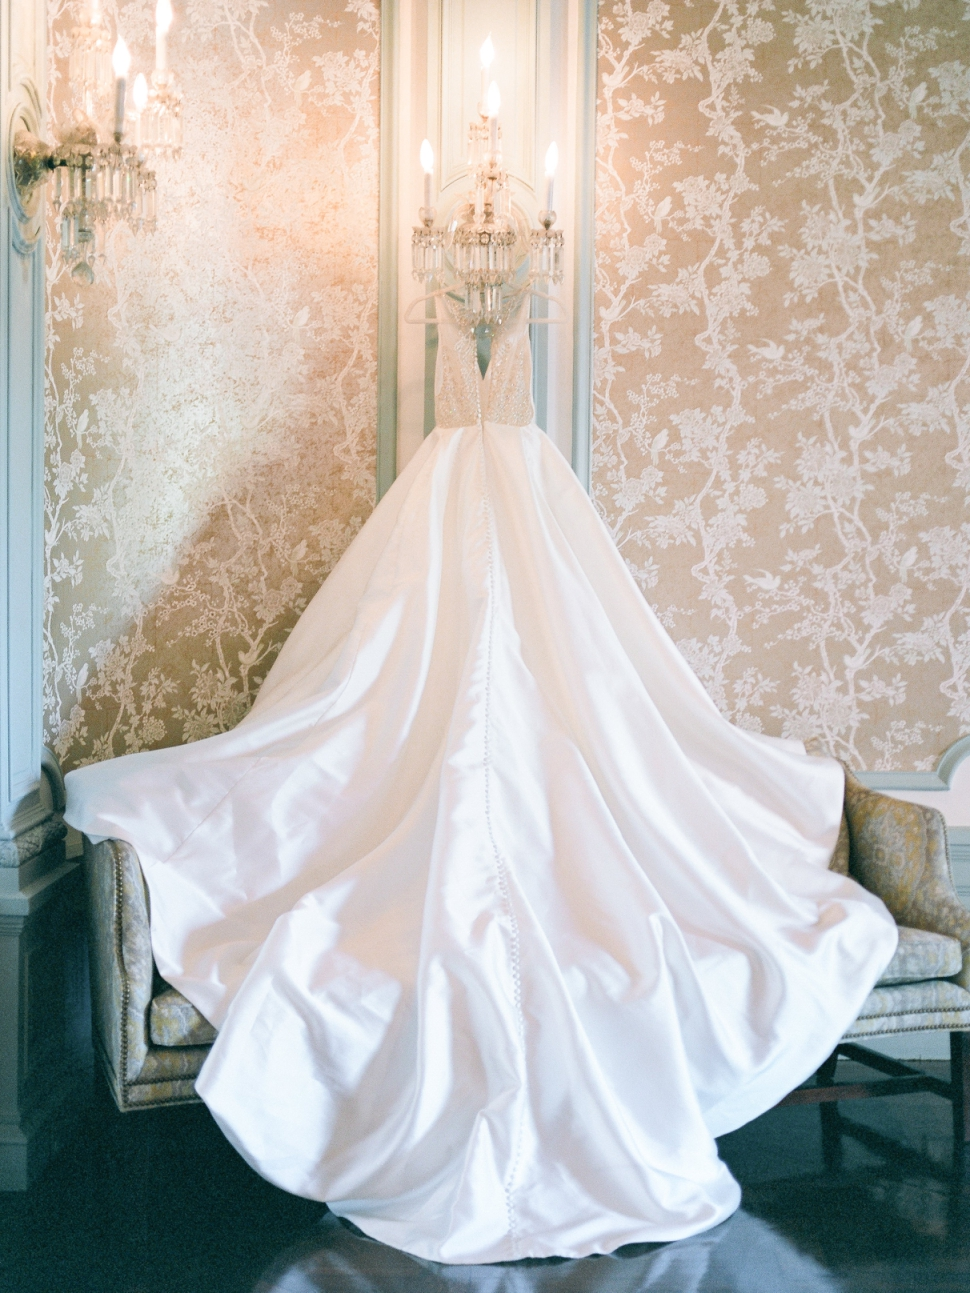 Bourne-Mansion-Wedding-Photos-Cassi-Claire-Long-Island-Wedding-Photographer_04.jpg